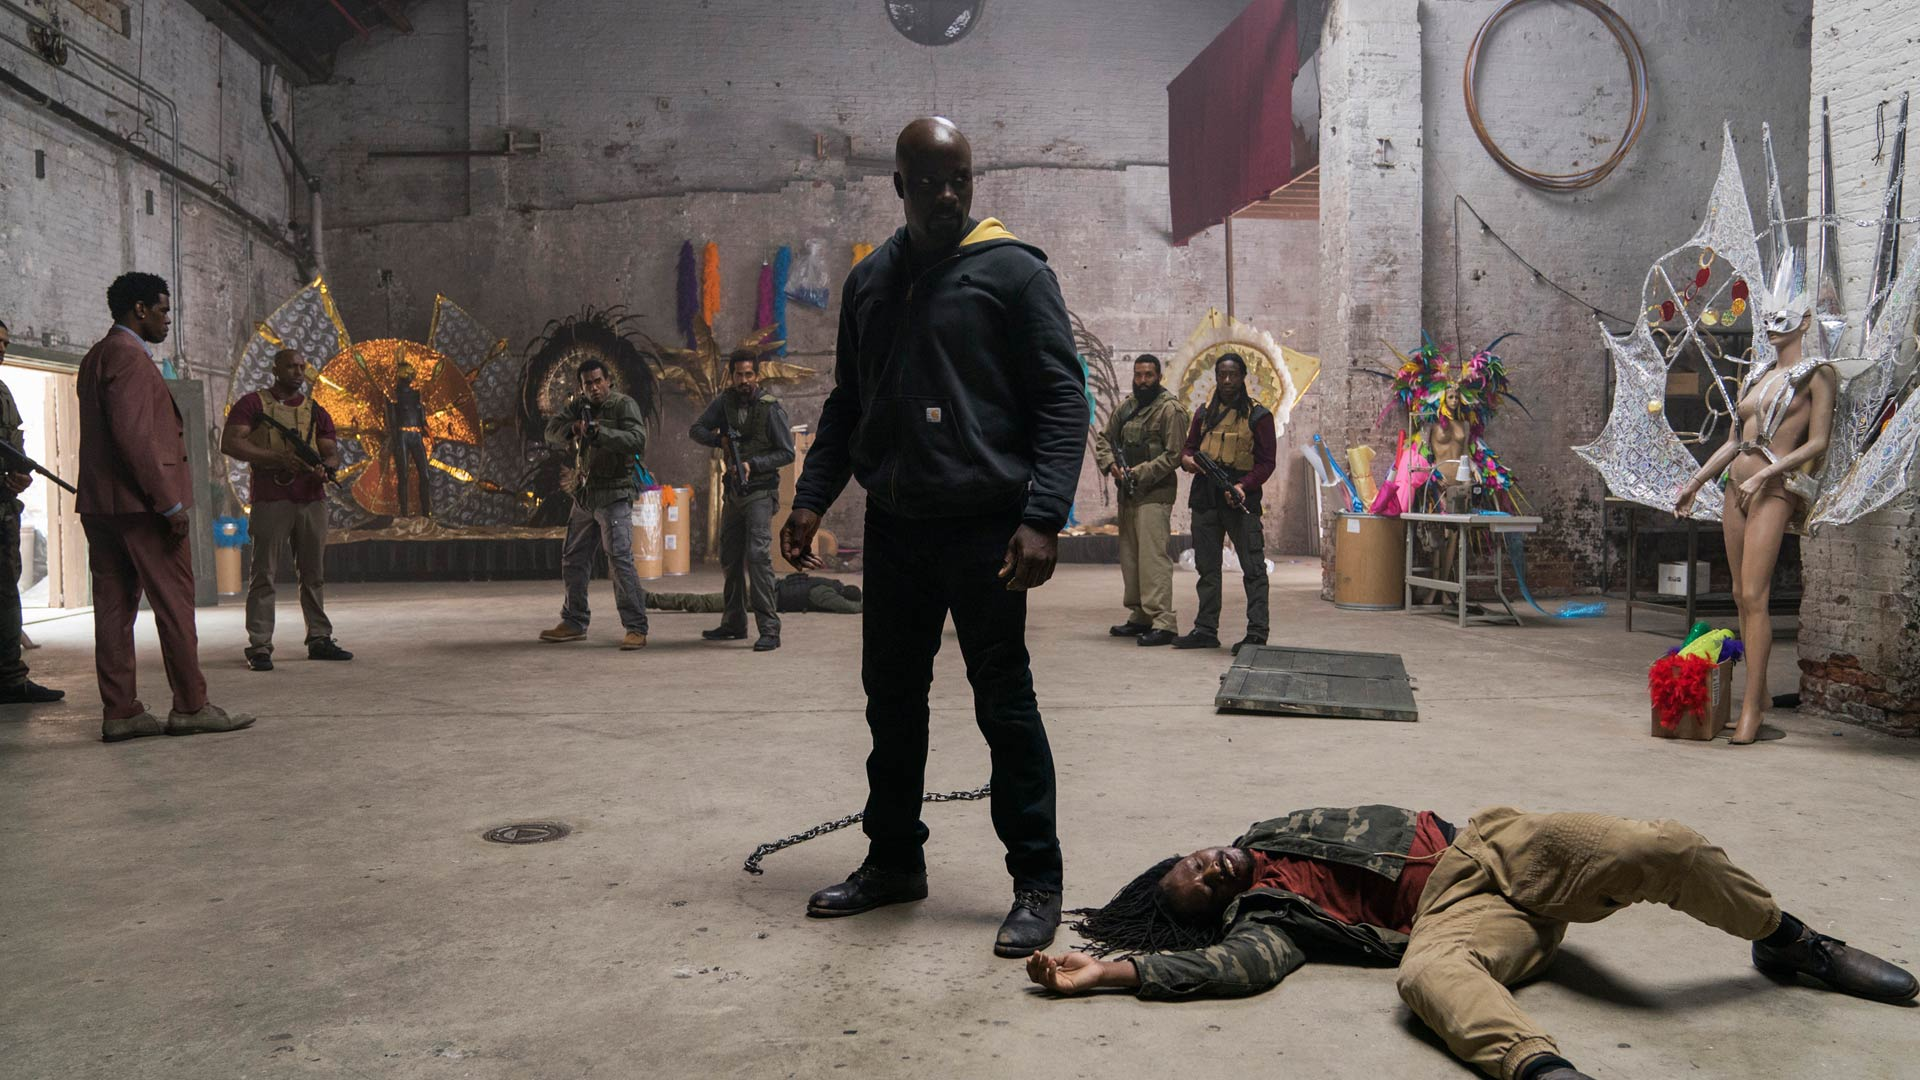 Luke Cage Season 2 Wallpaper